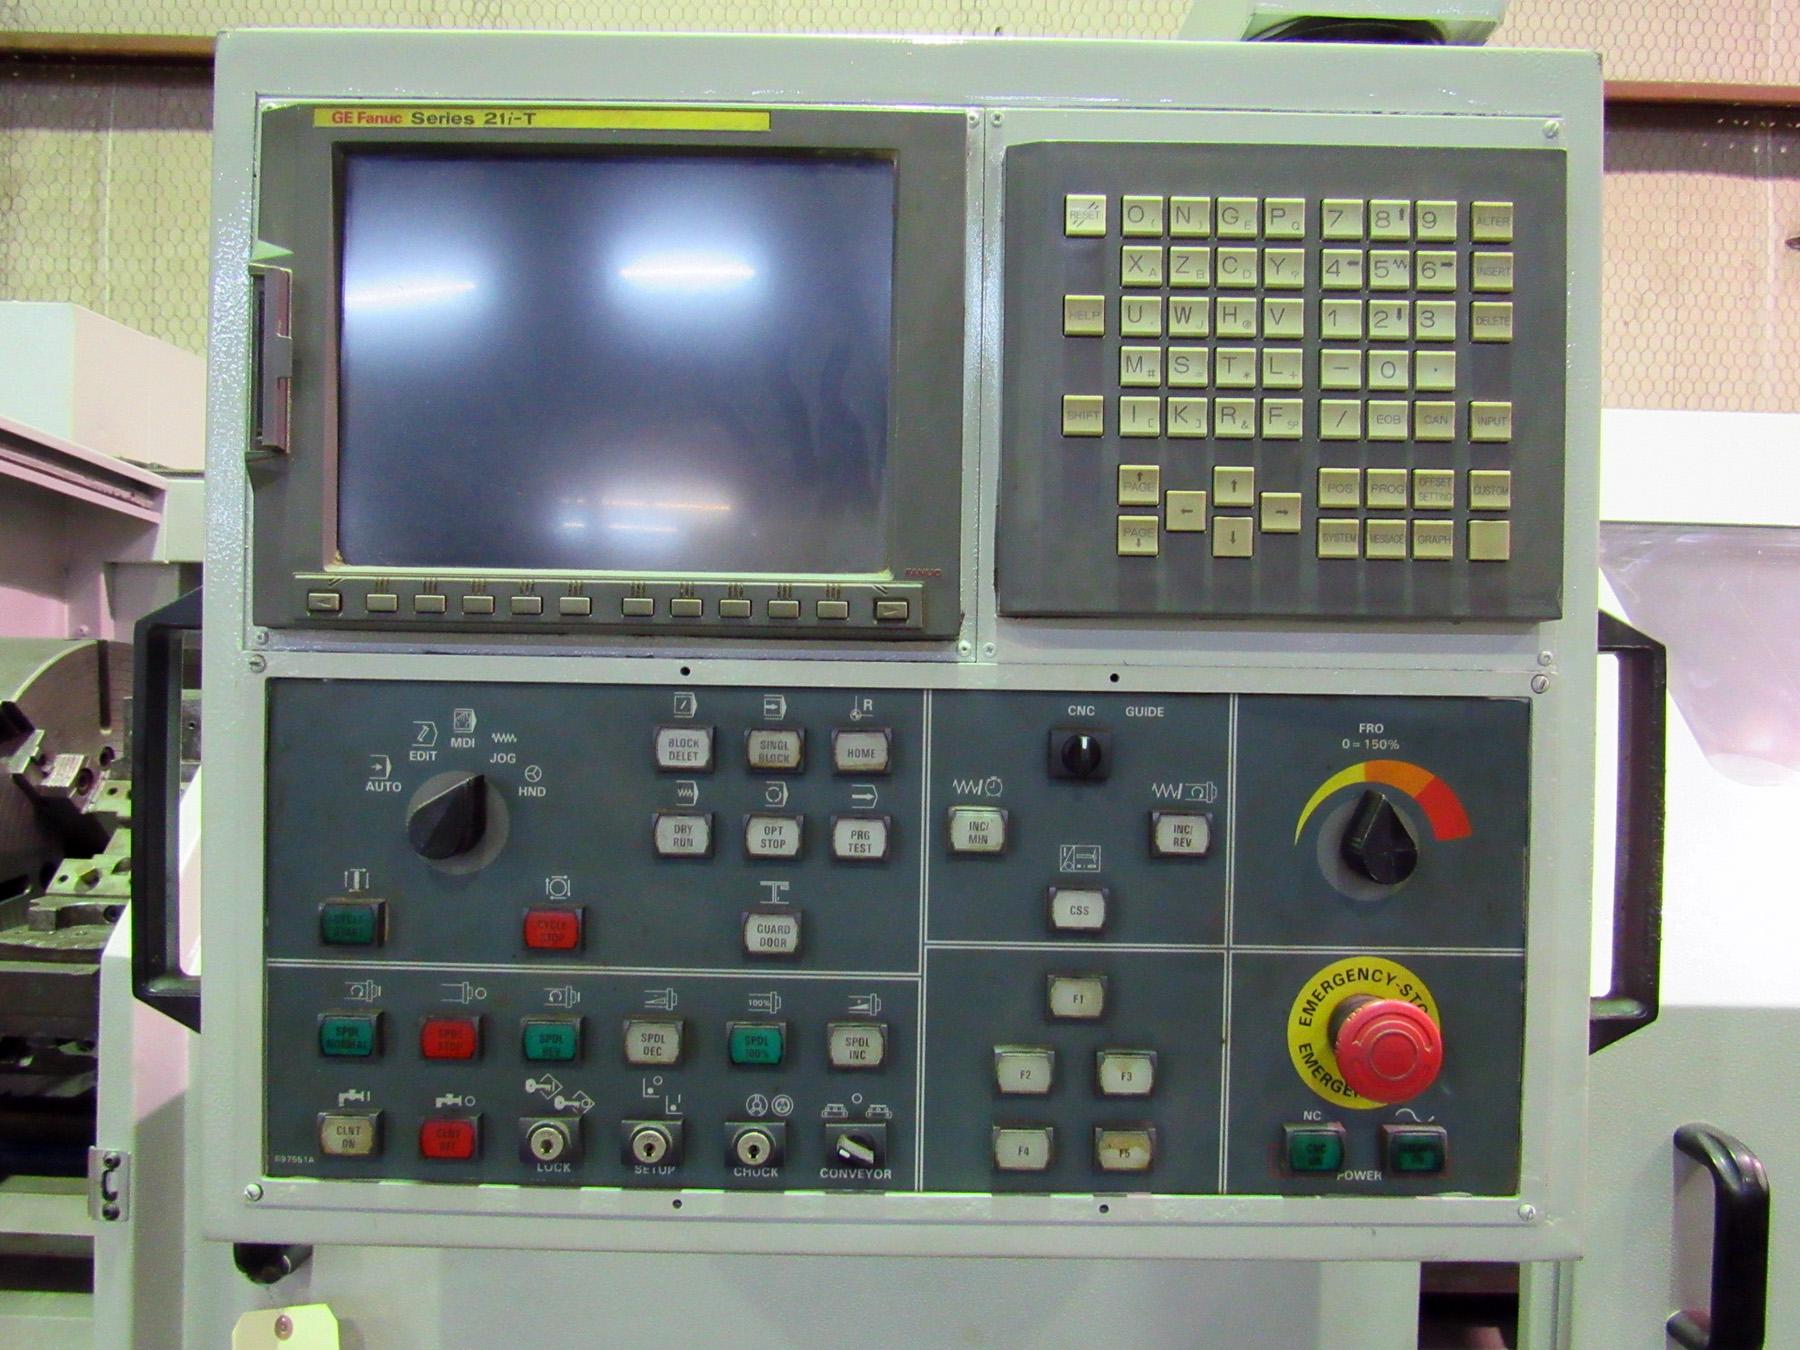 "Lot 29 - ROMI MDL. M-27 27"" X 80"" COMBINATION CNC LATHE, new 2007, G.E. Fanuc 21i-T CNC control, 21"" dia. 4-"